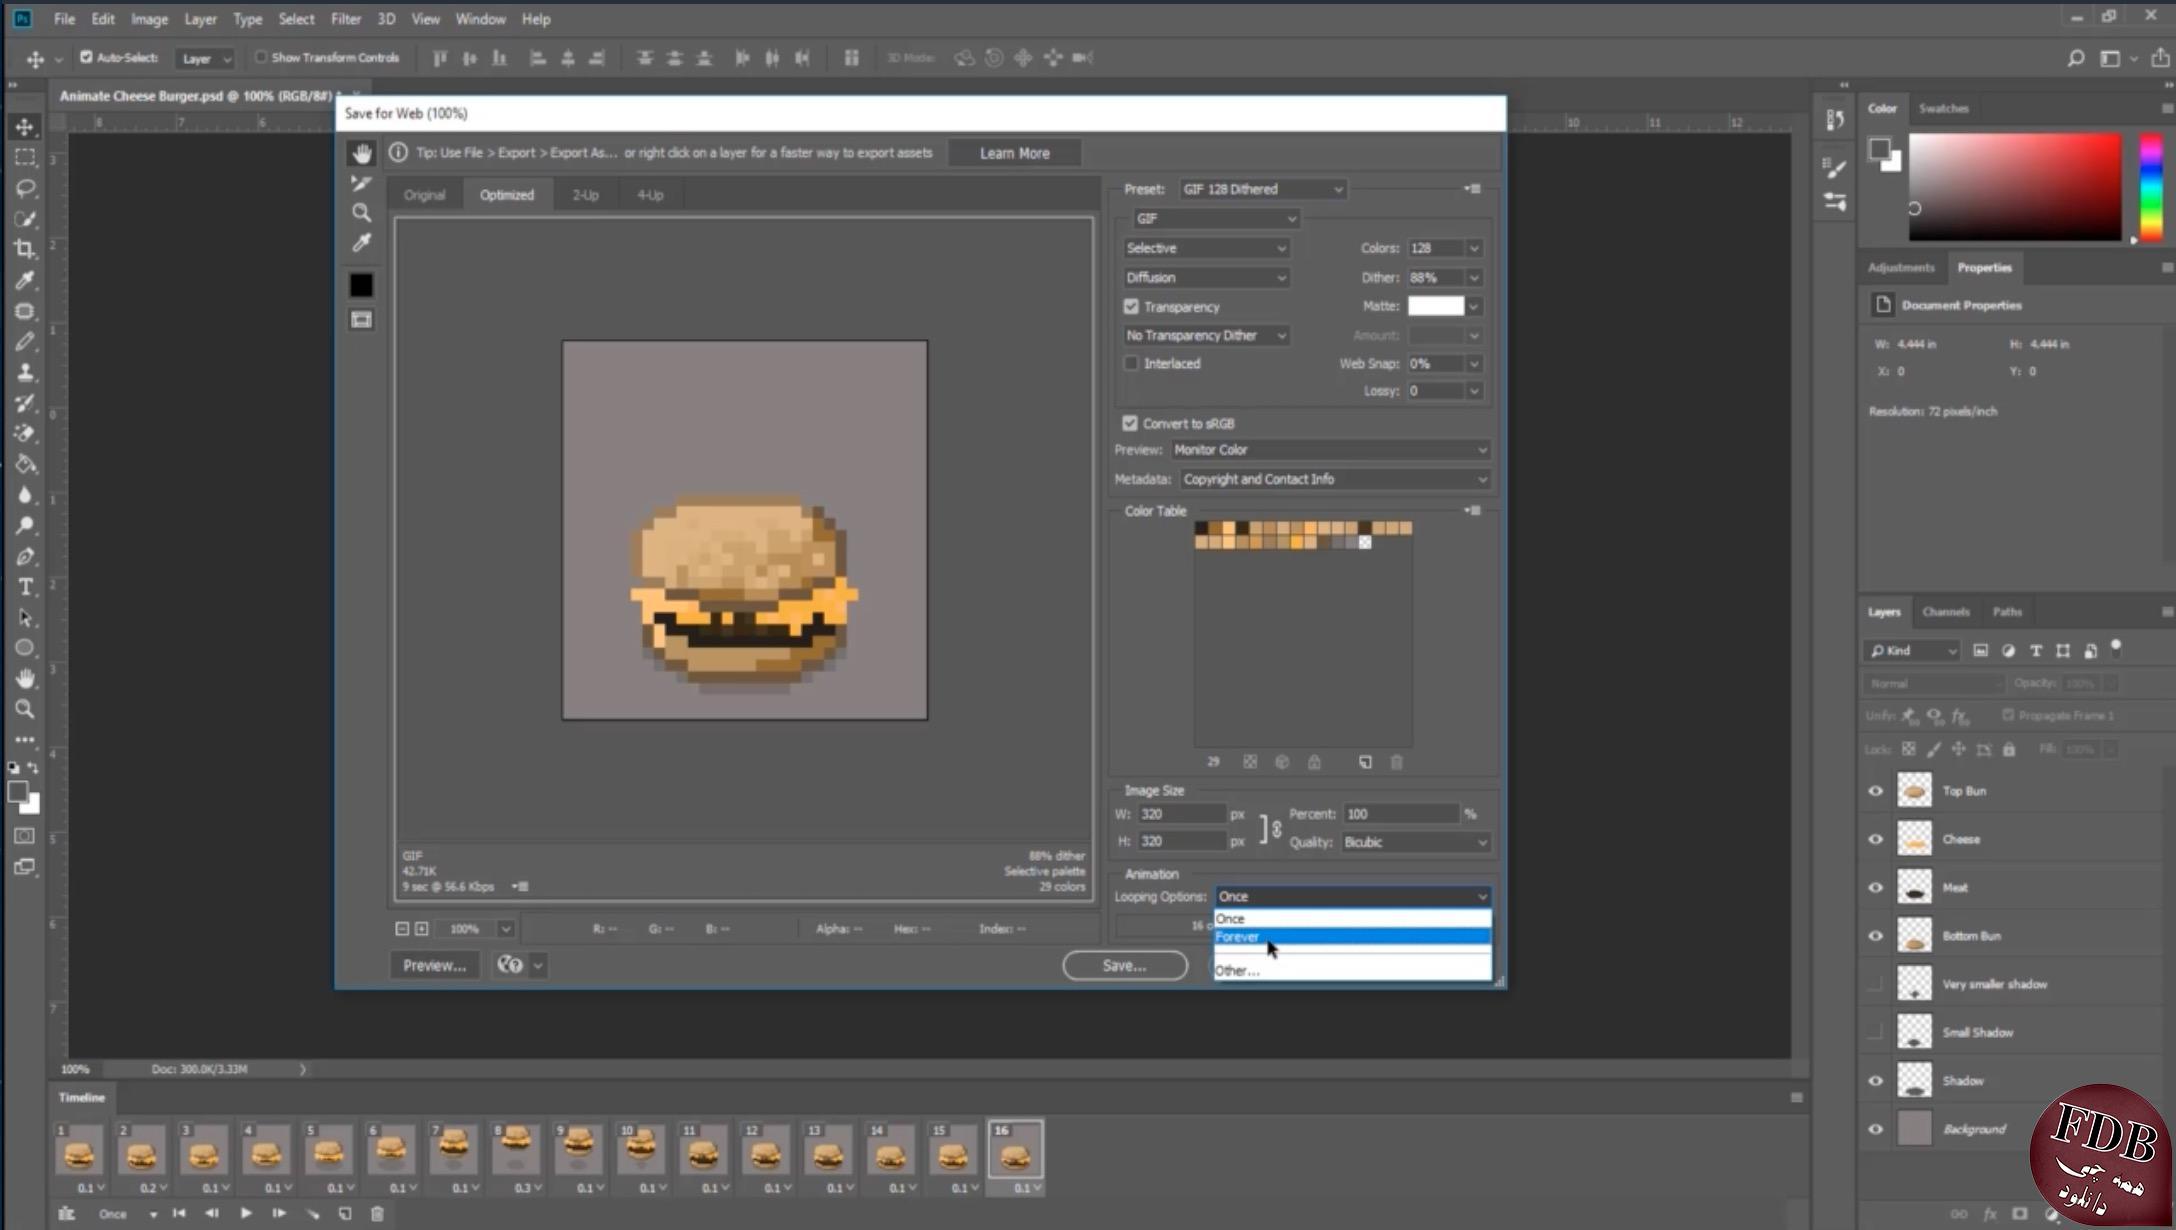 دانلود Udemy Pixel Art In Adobe Photoshop For Beginners – ساخت گرافیک پیکسلی در فتوشاپ